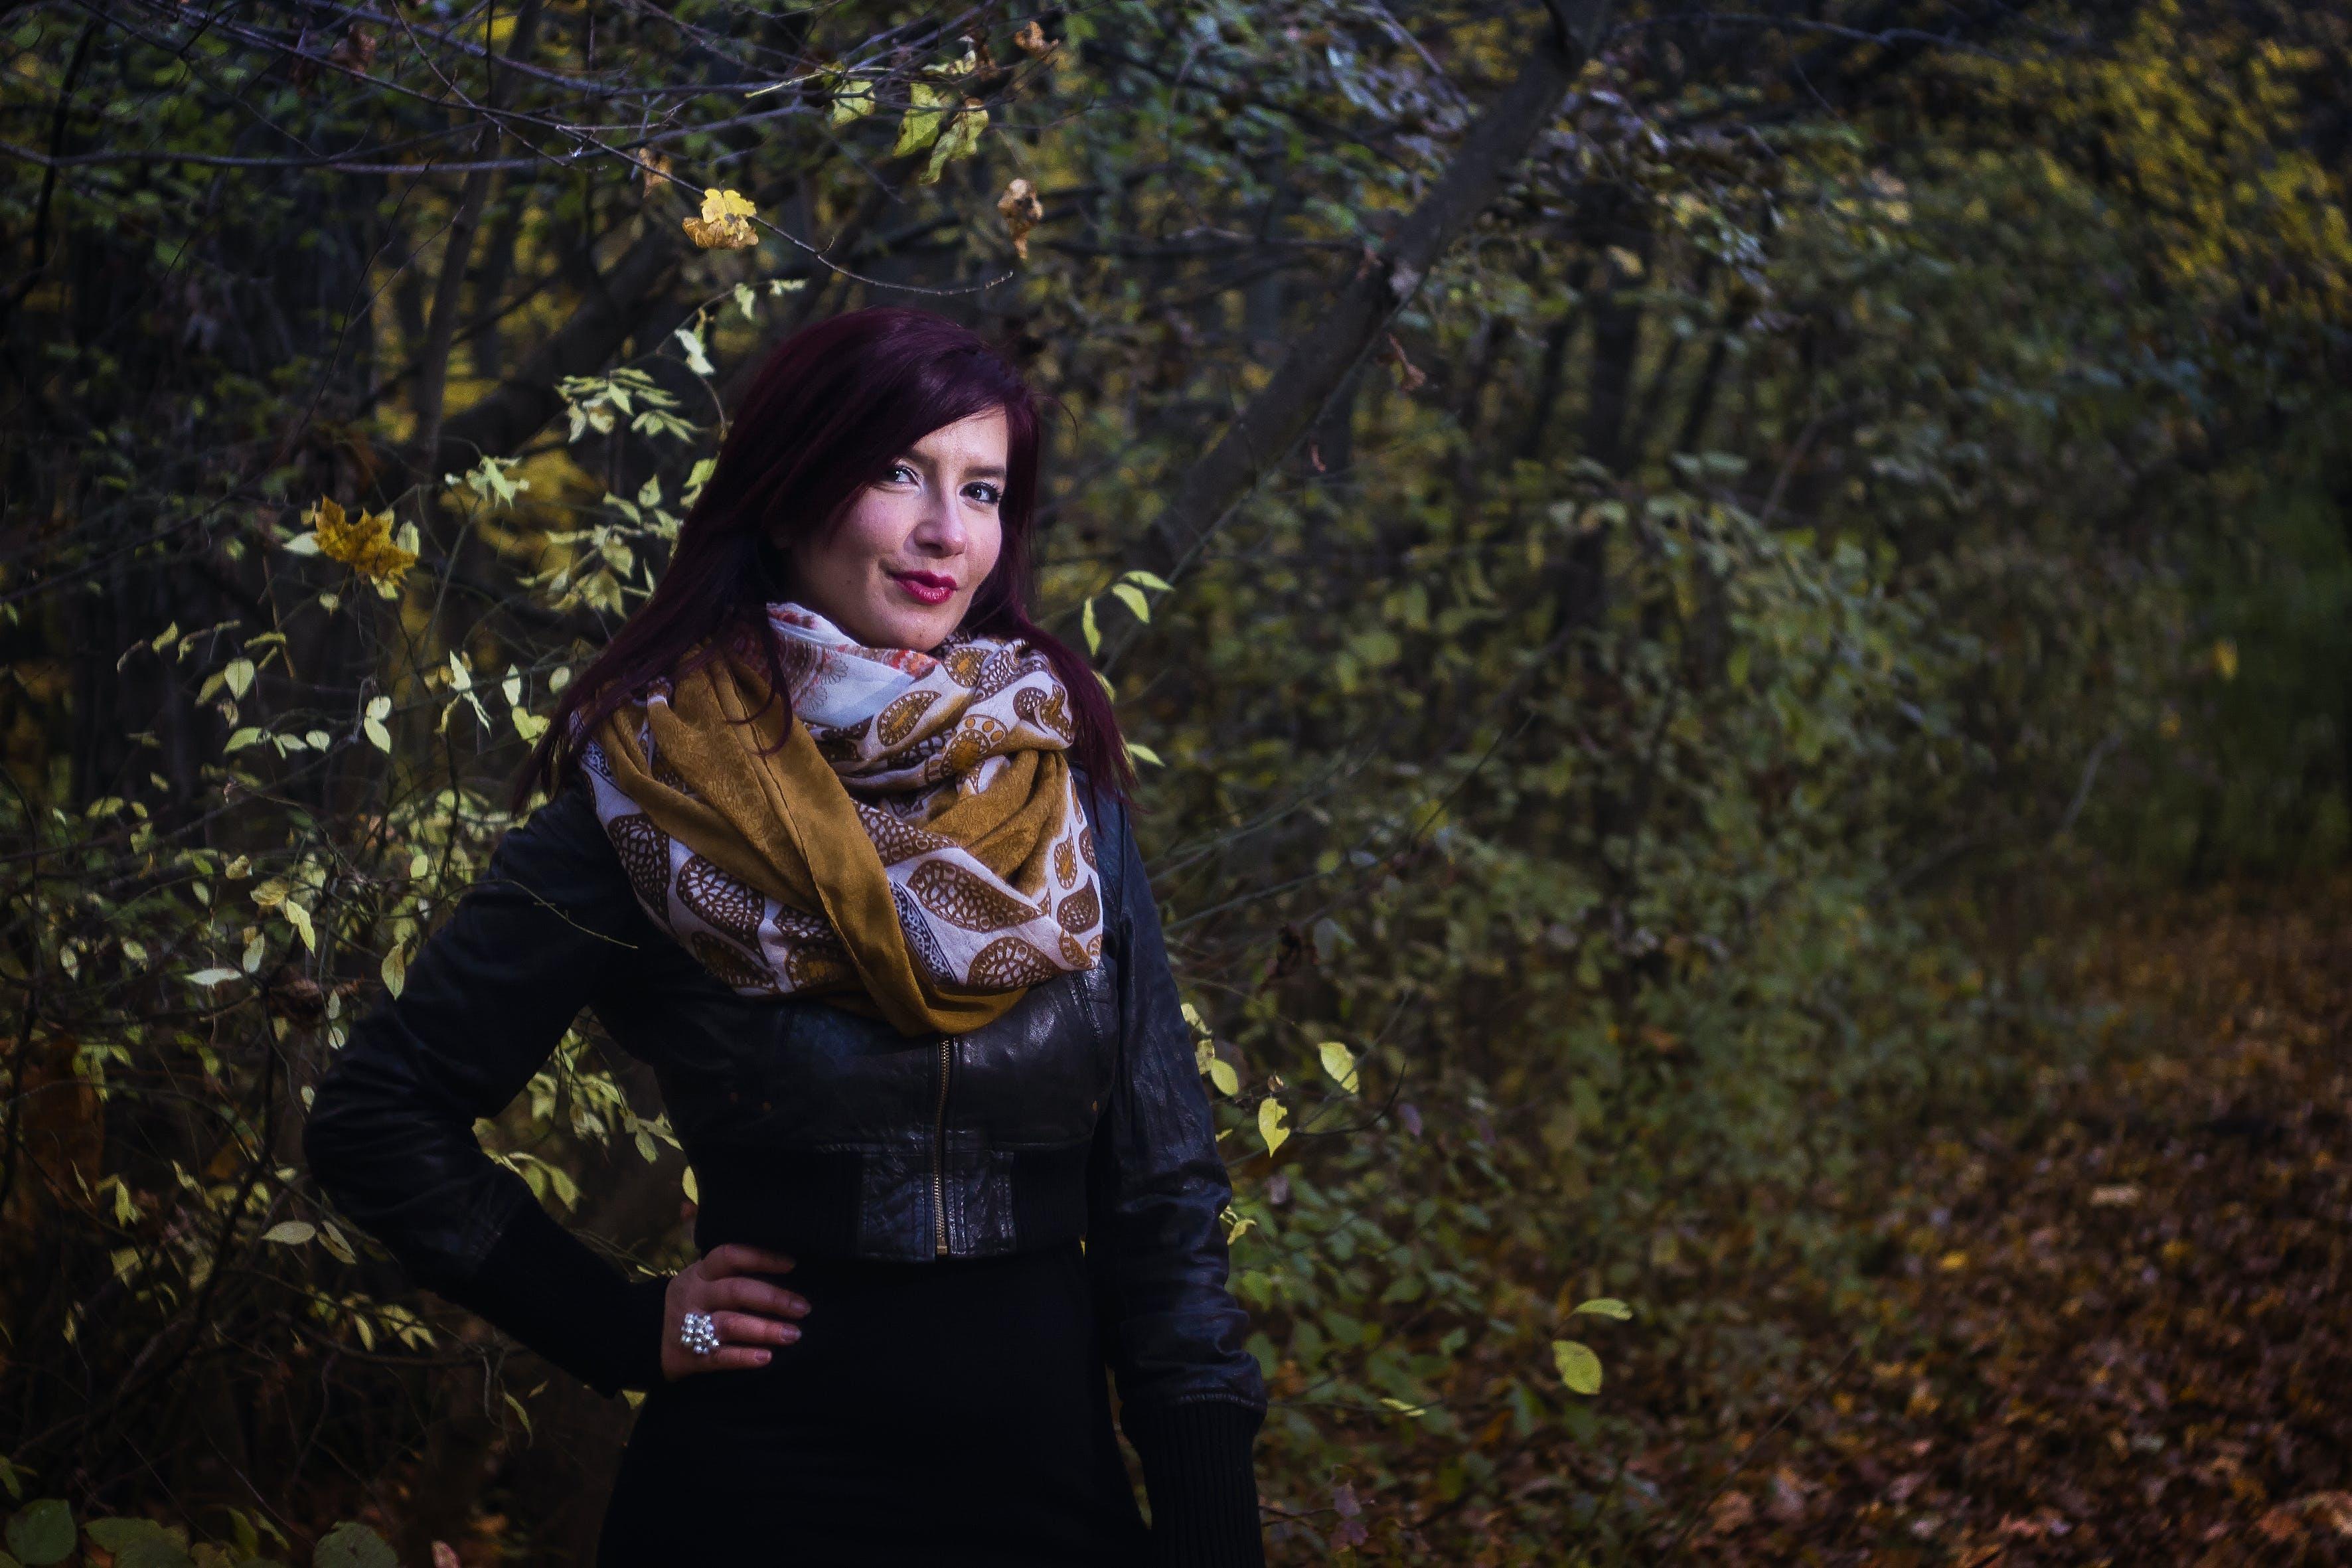 Woman in Black Leather Jacket Beside Trees